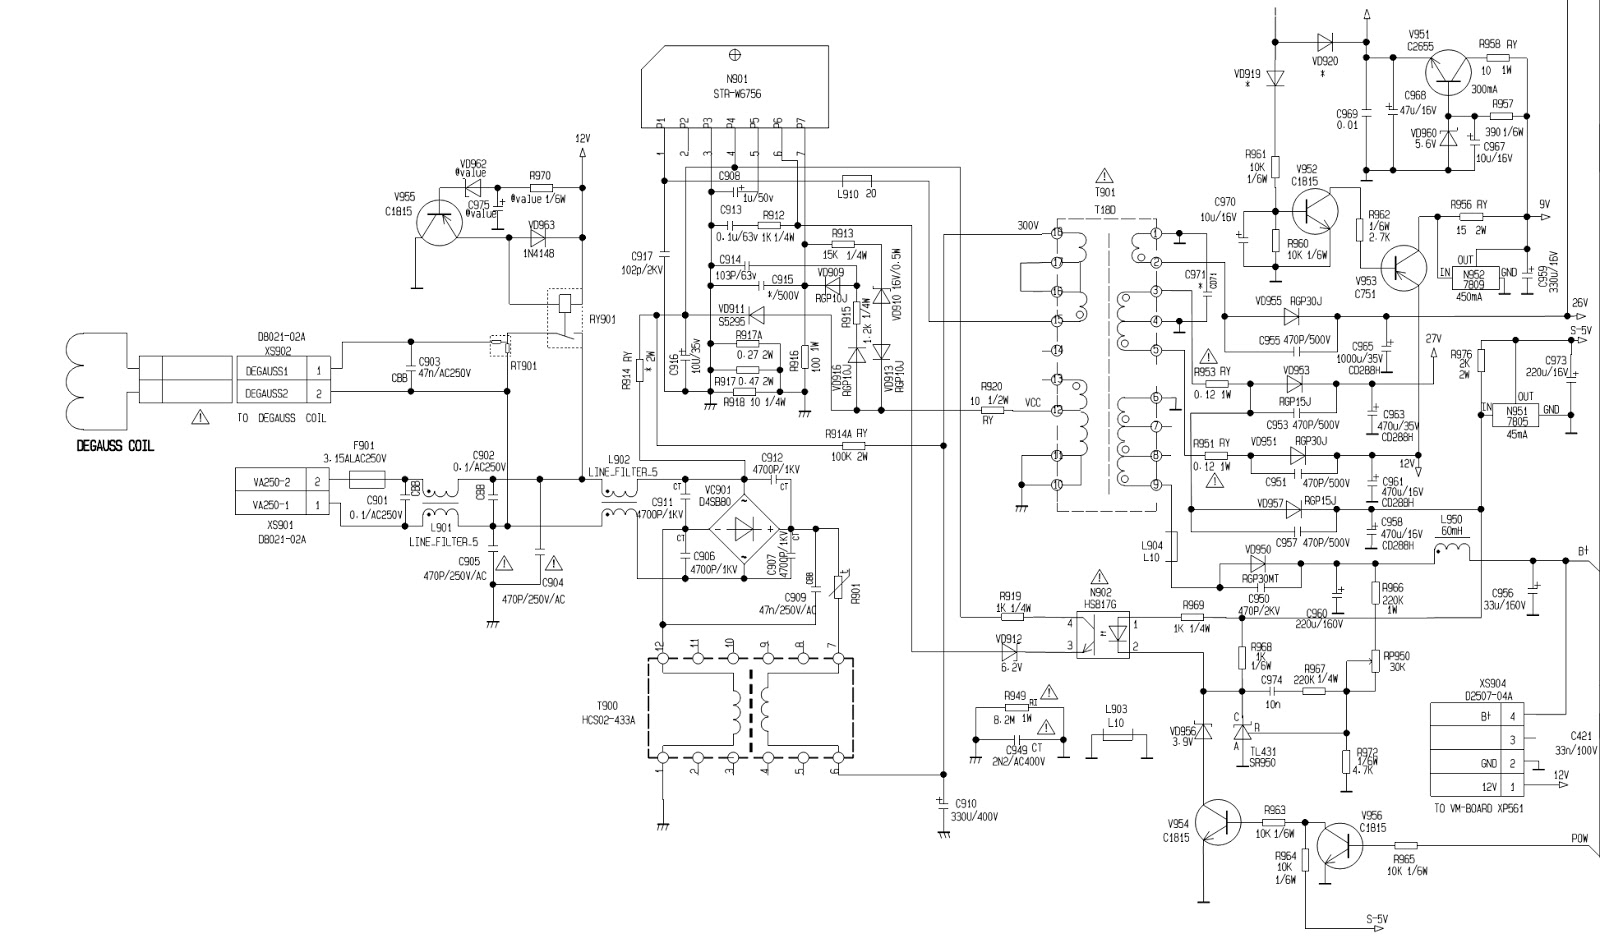 medium resolution of toshiba air conditioner wiring diagram wiring diagram main pc board mcc713 toshiba ras10sax user